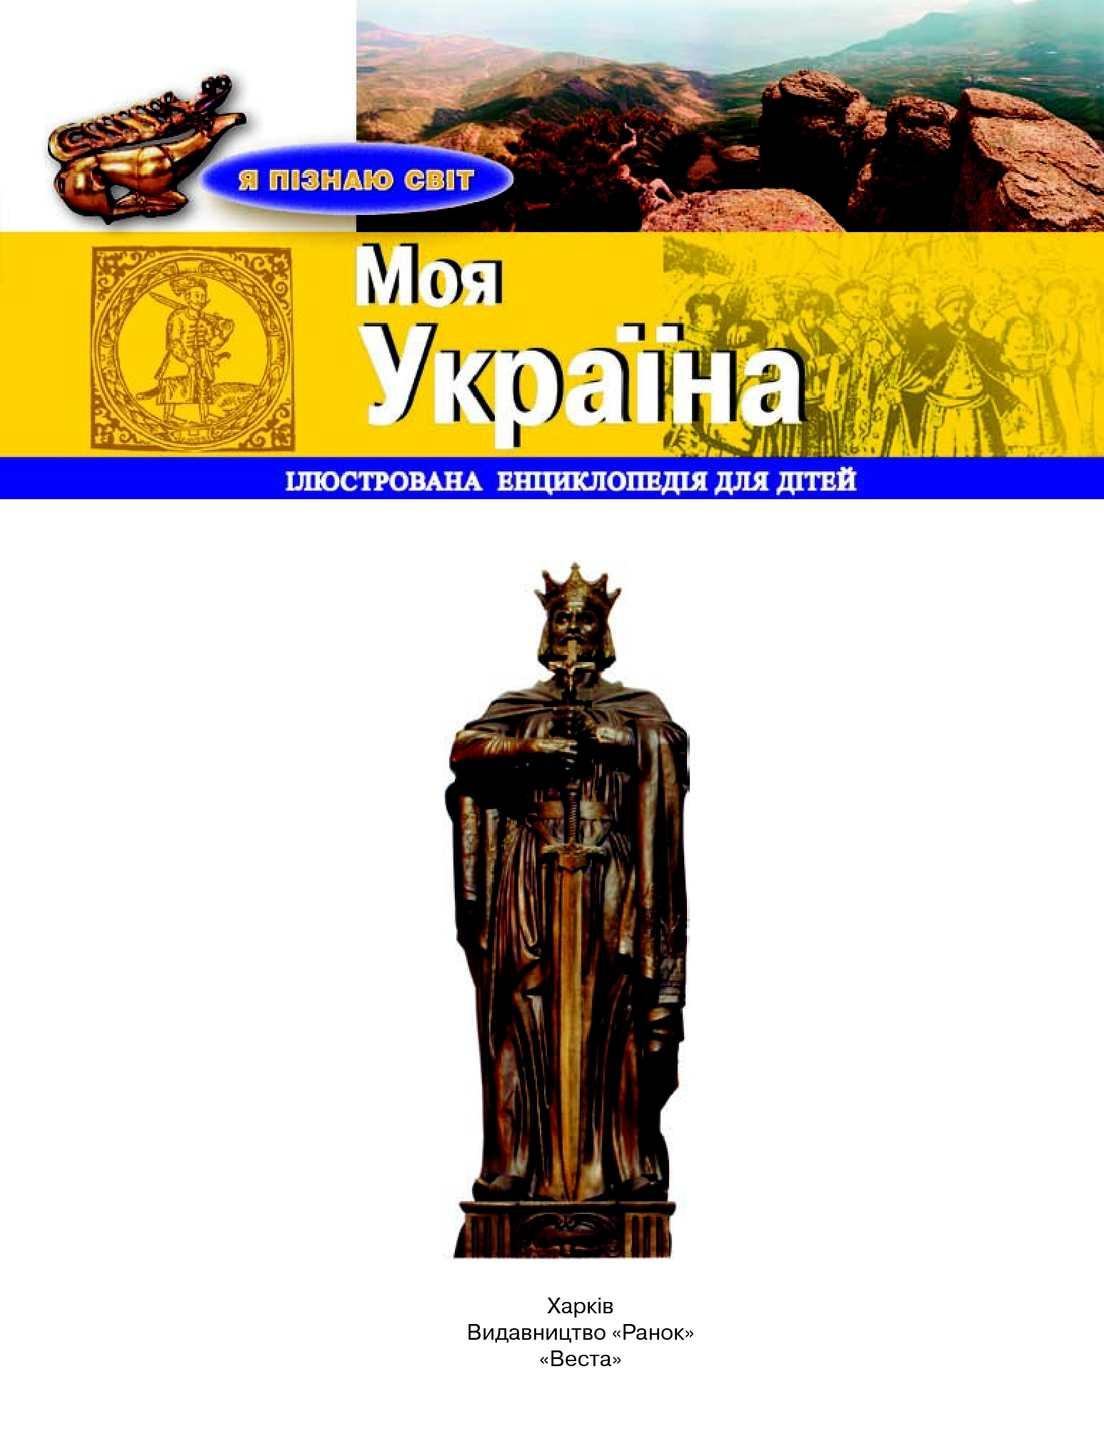 Calaméo - Моя Україна - енциклопедія для дітей 2e54fcdd5fa0a